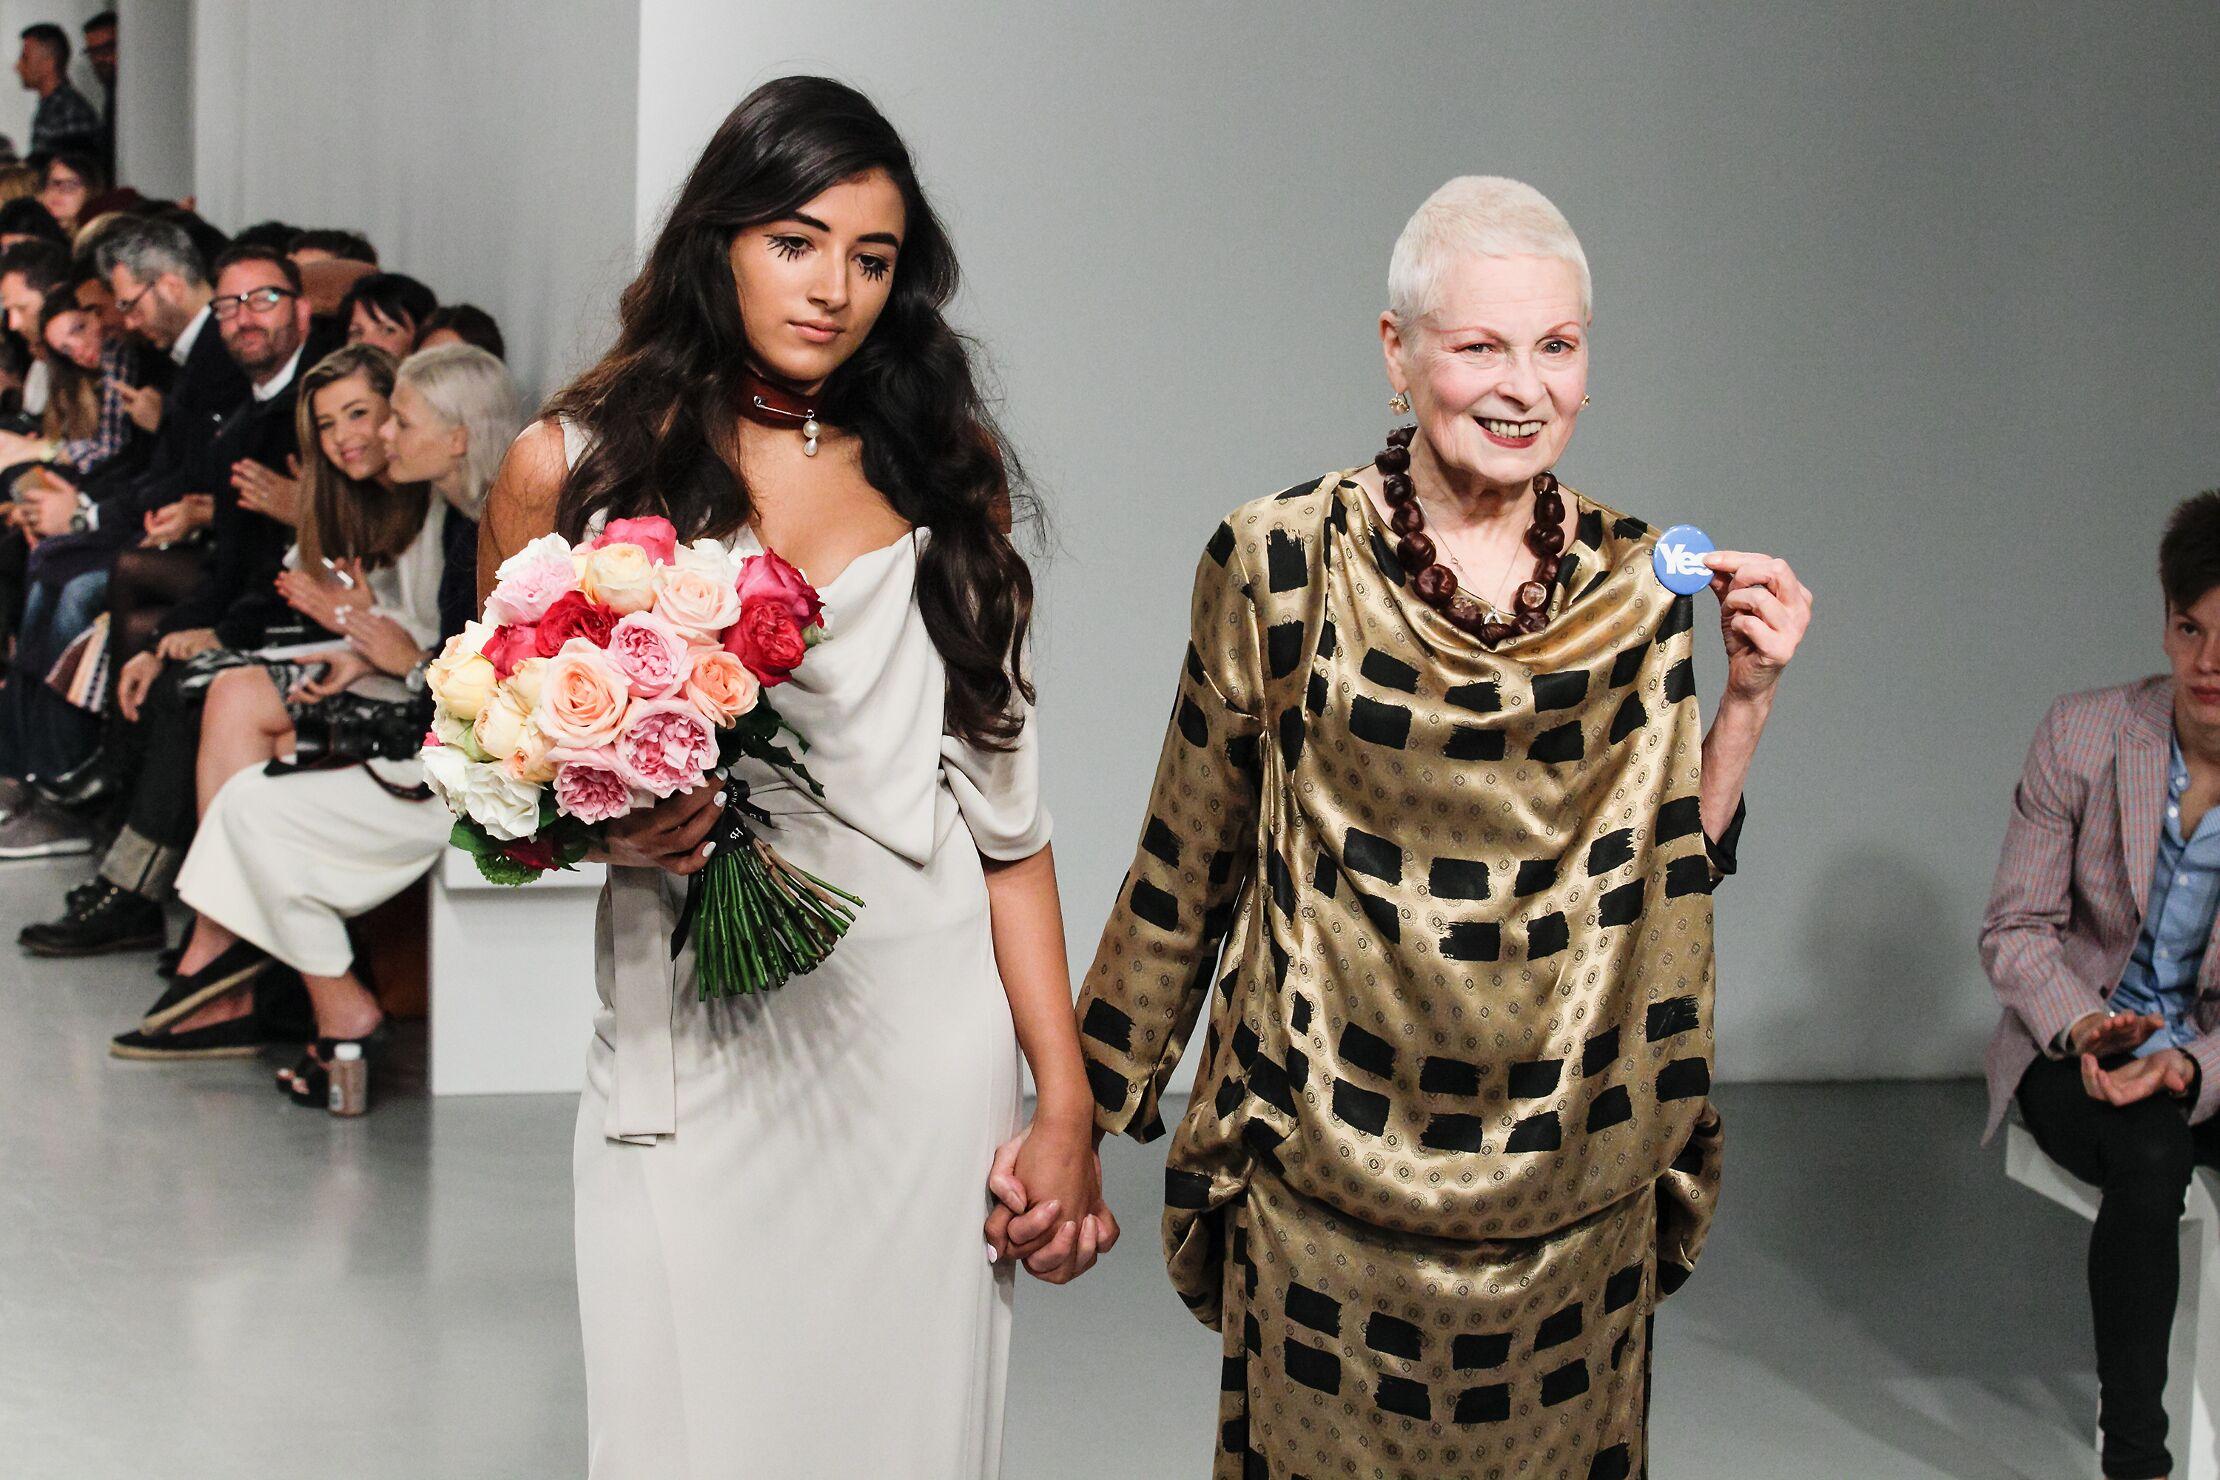 Thế giới quan của NTK Vivienne Westwood 2